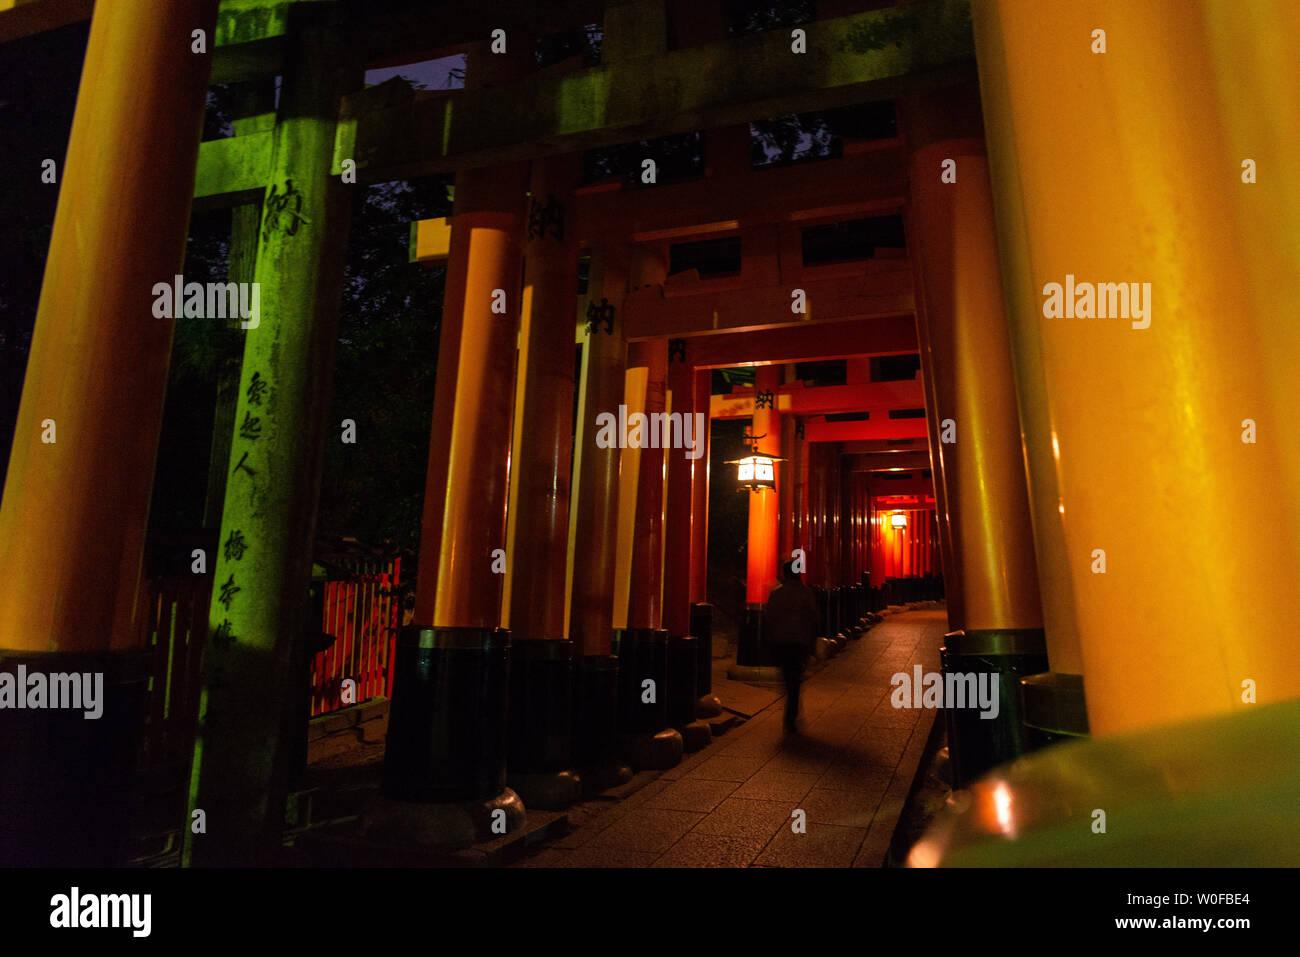 Fushimi Inari taisha, Kyoto, Kansai, Honshu, Japan. Tori. - Stock Image